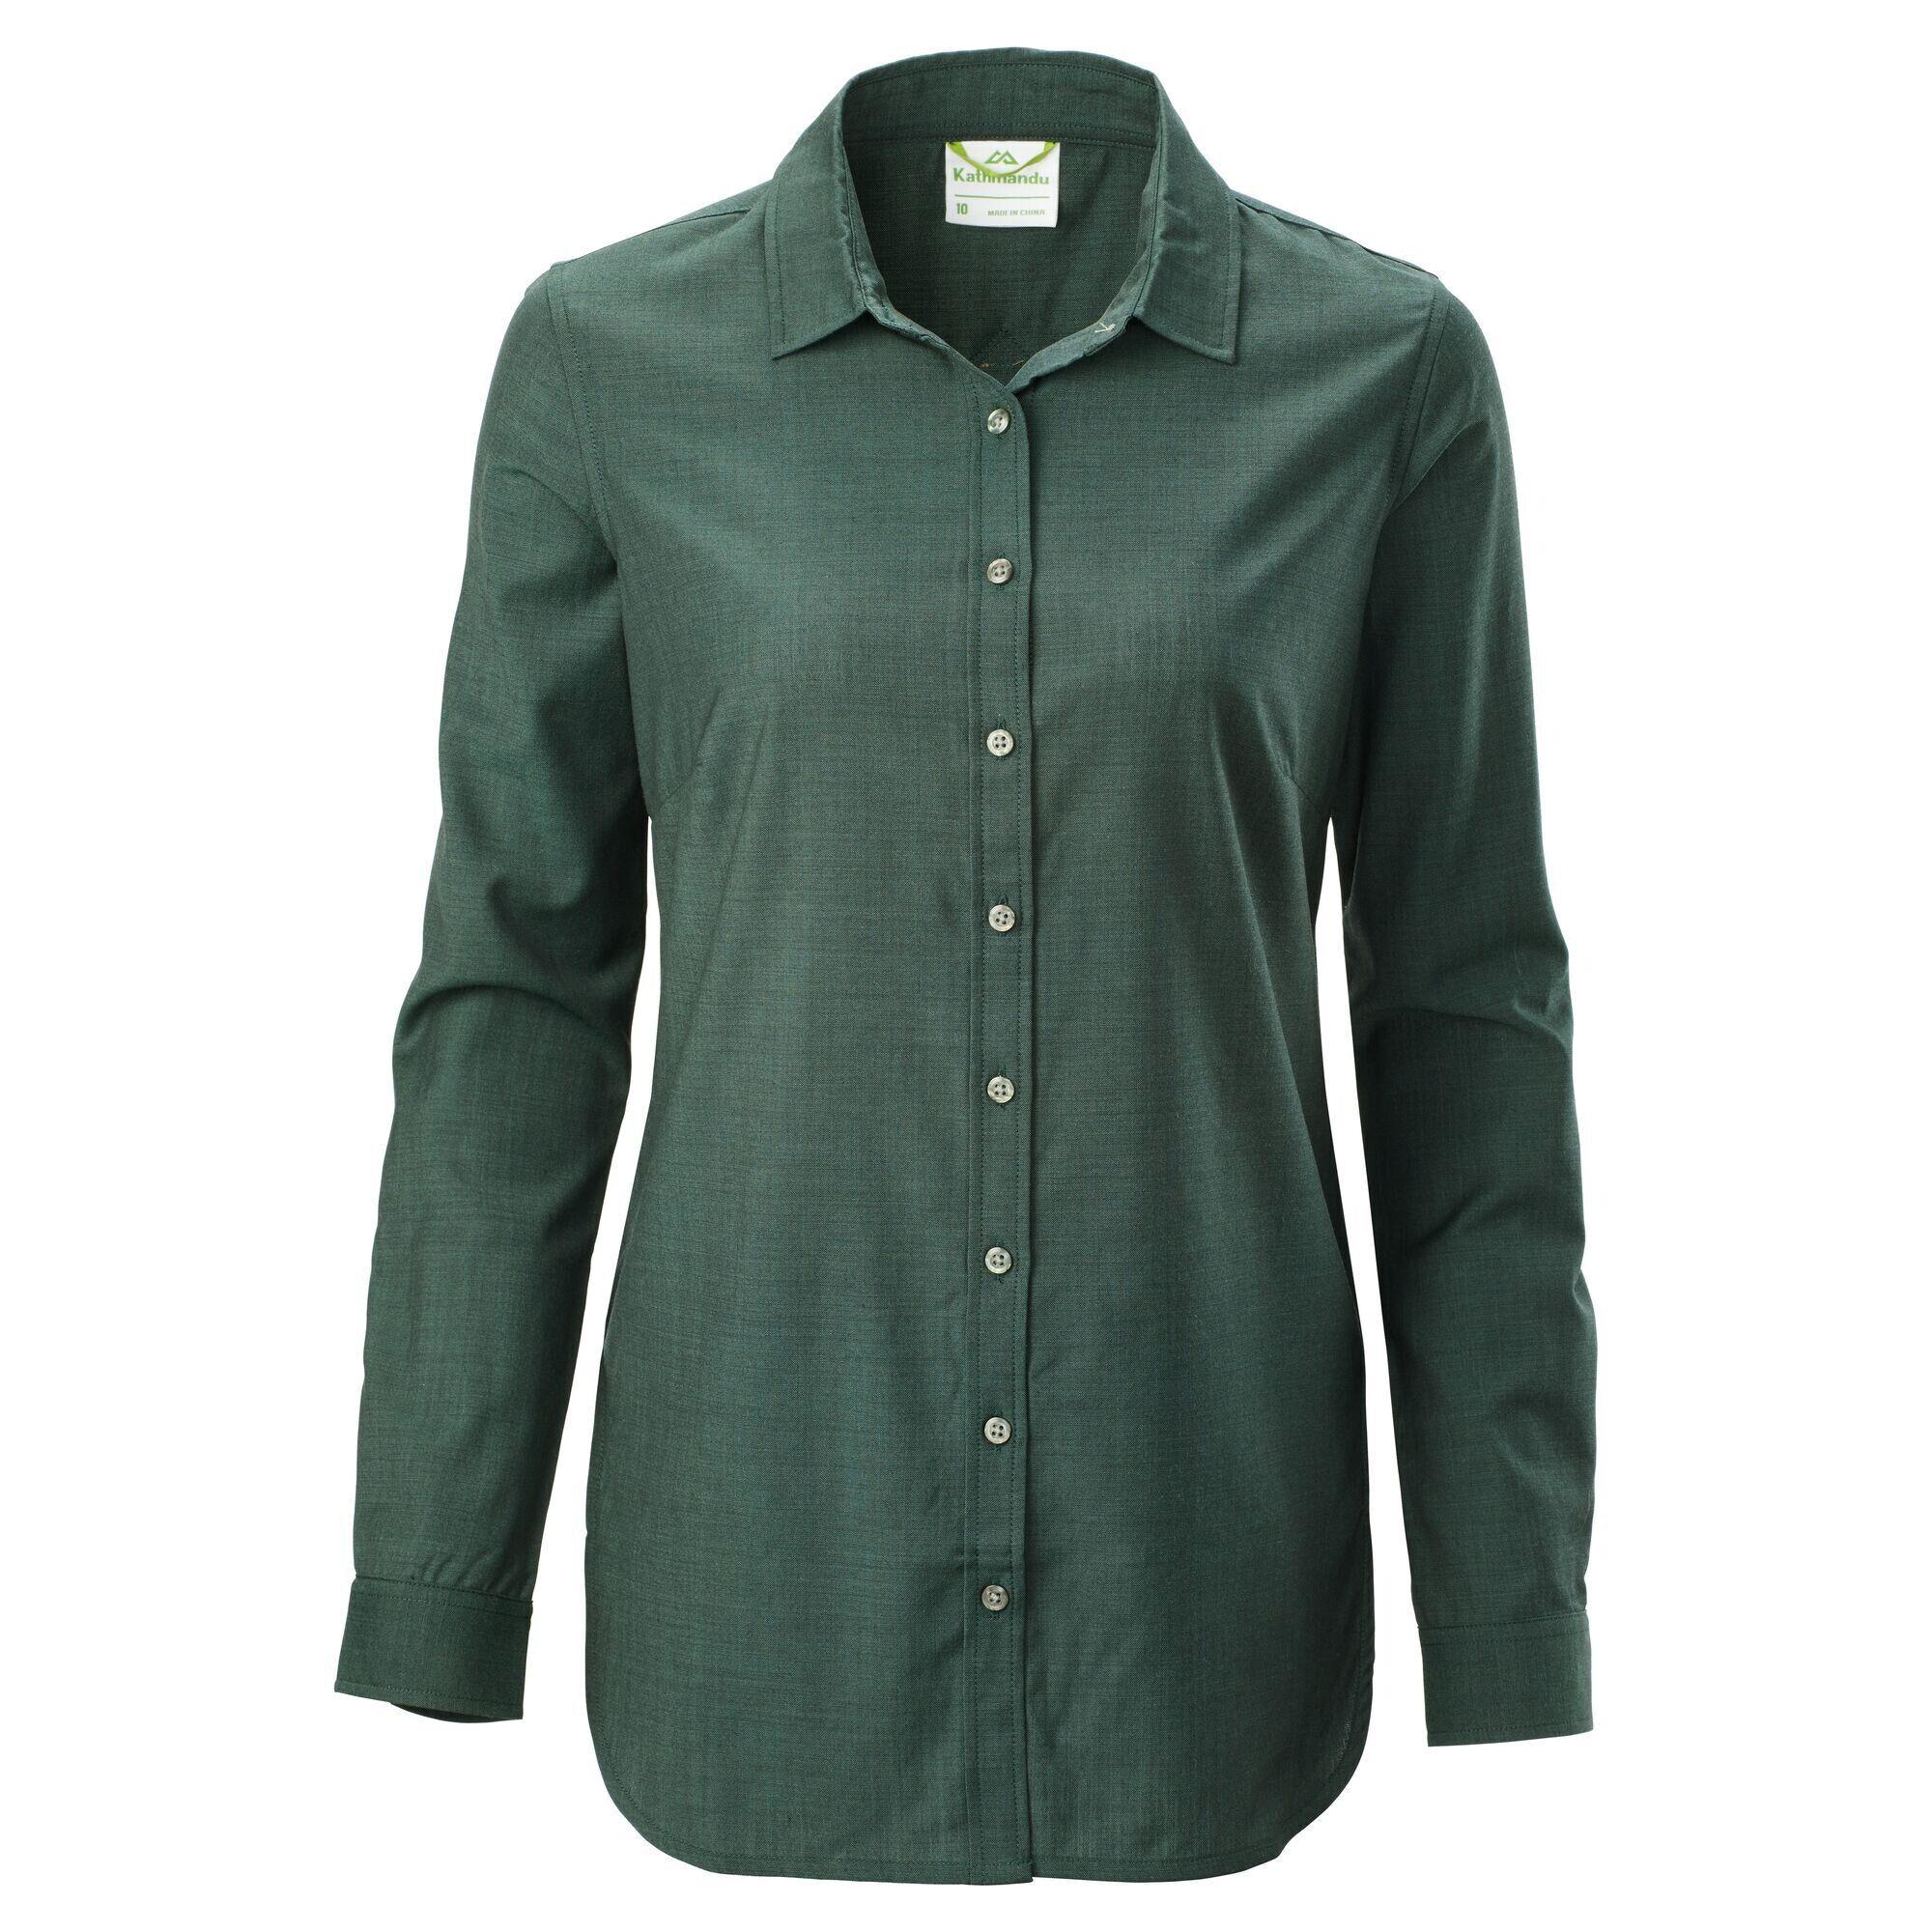 Kathmandu Tomar Women's Merino Long Sleeve Shirt  - Dark Spruce - Size: US 4